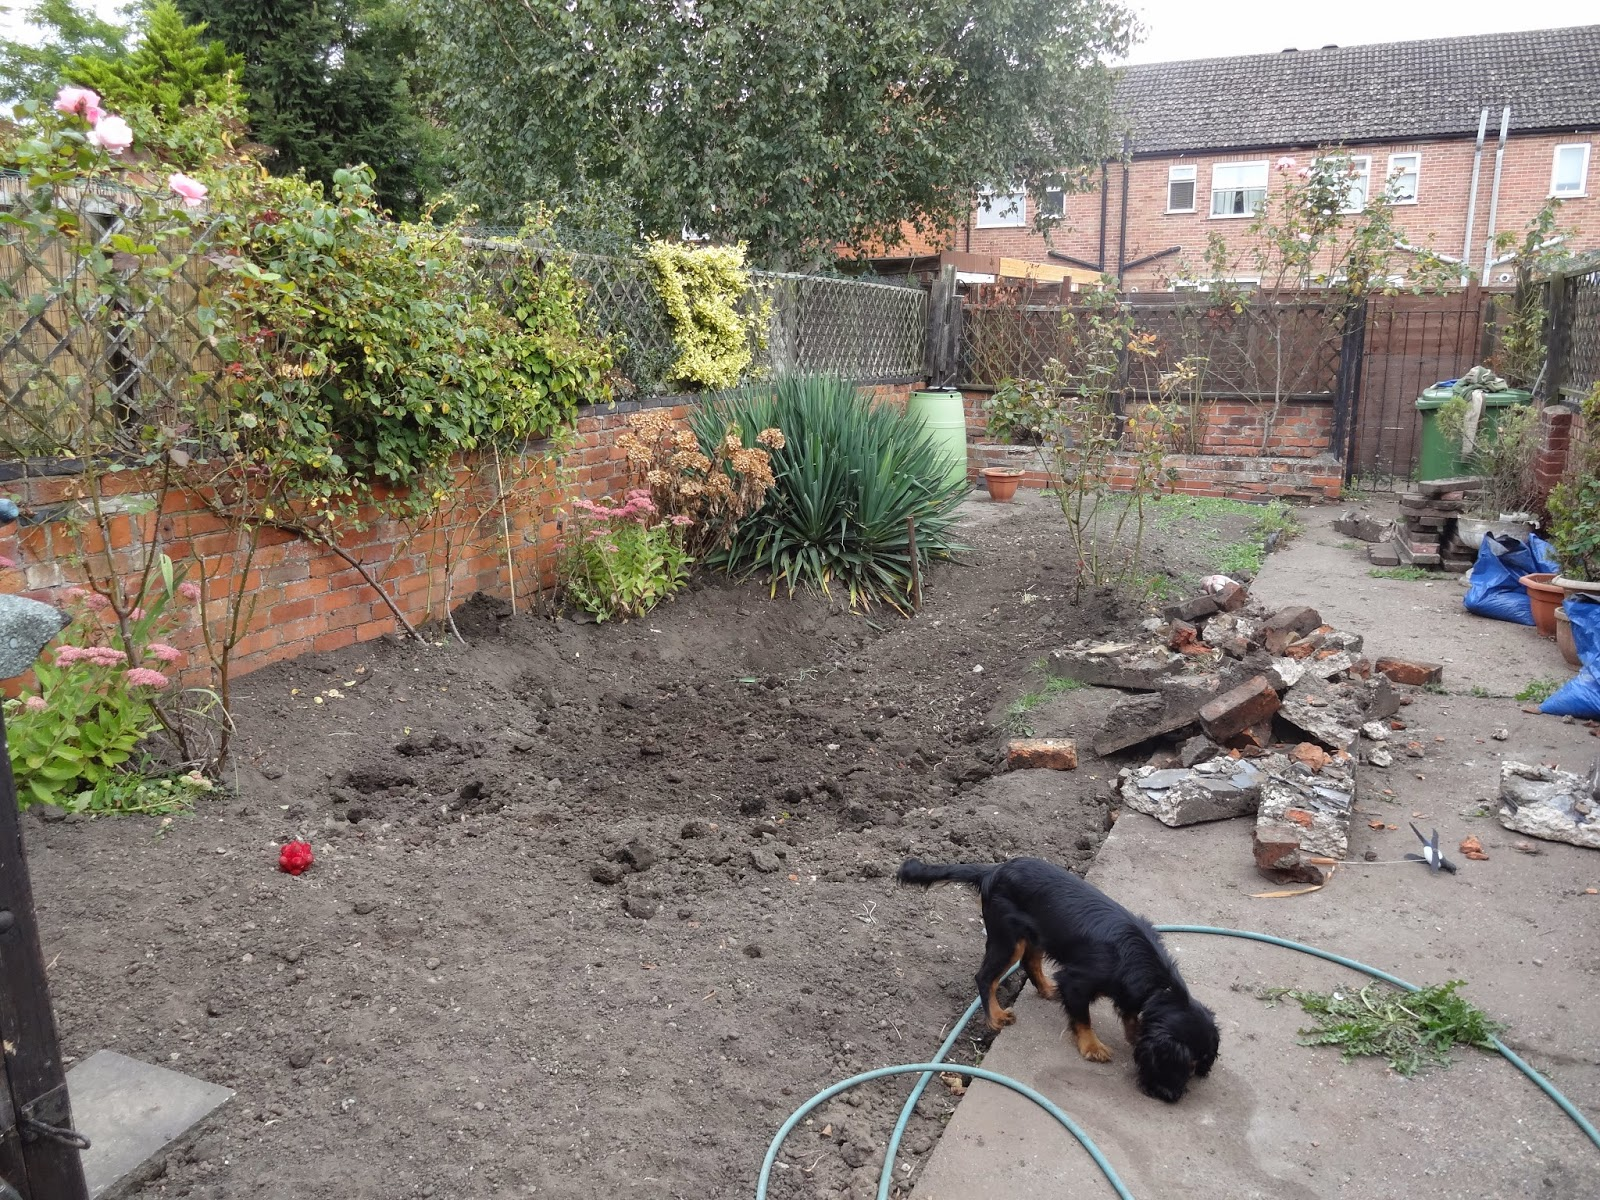 Kezzabeth co uk | UK Home Renovation, Interiors and DIY Blog